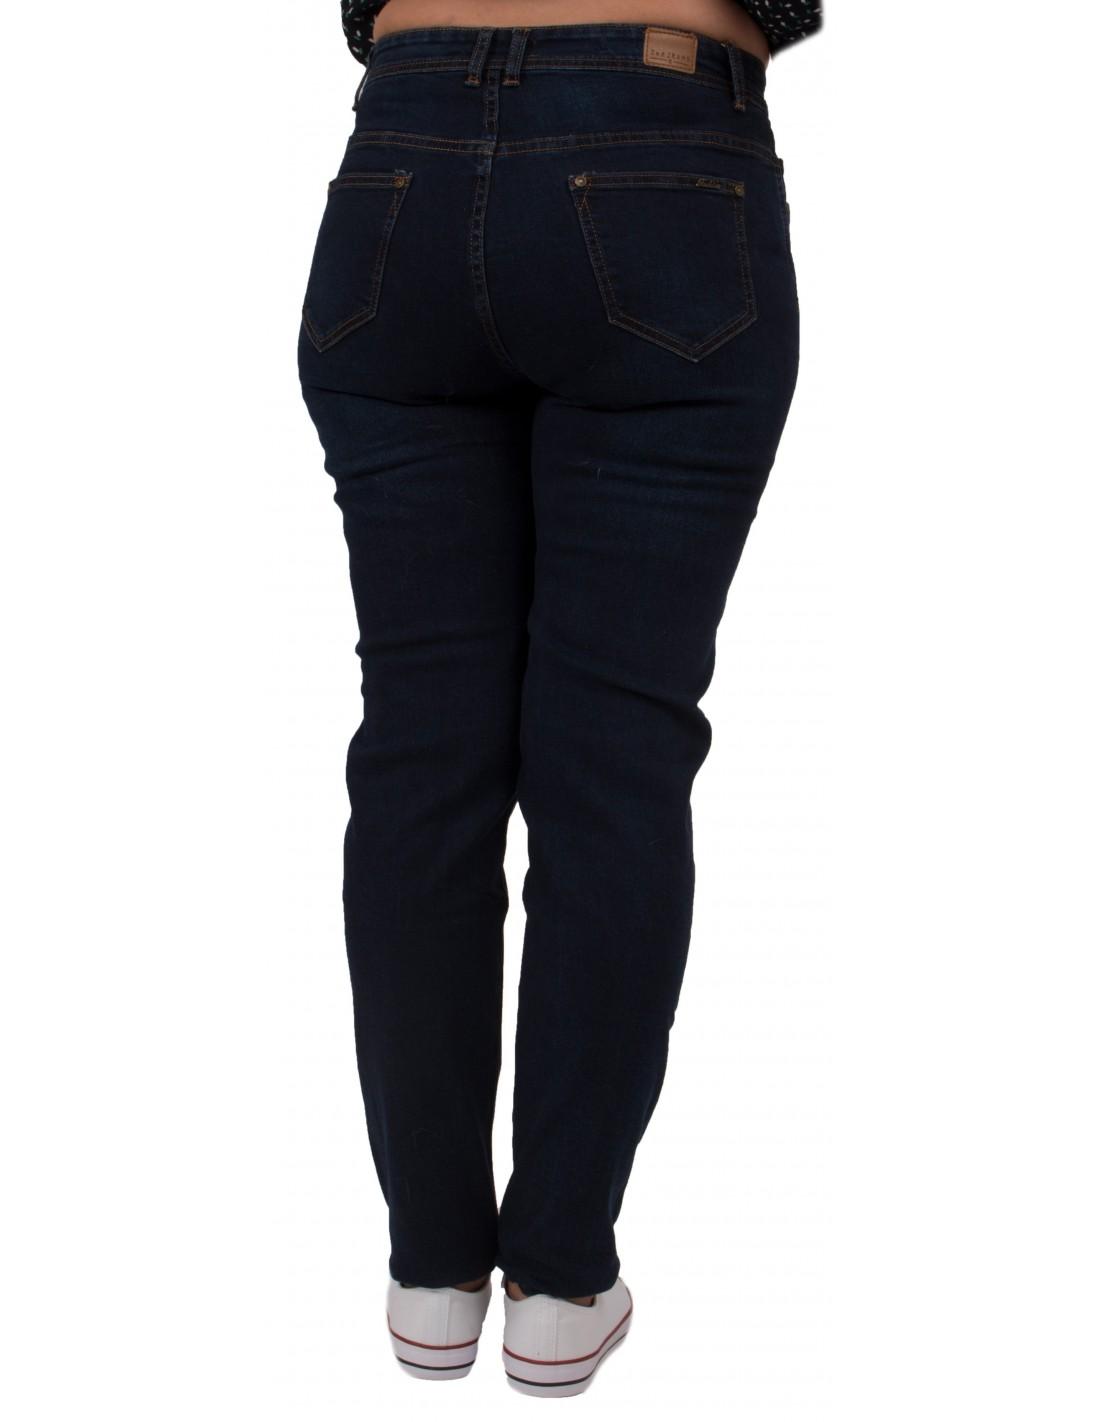 jean slim grande taille bleu brut taille haute du 42 au. Black Bedroom Furniture Sets. Home Design Ideas